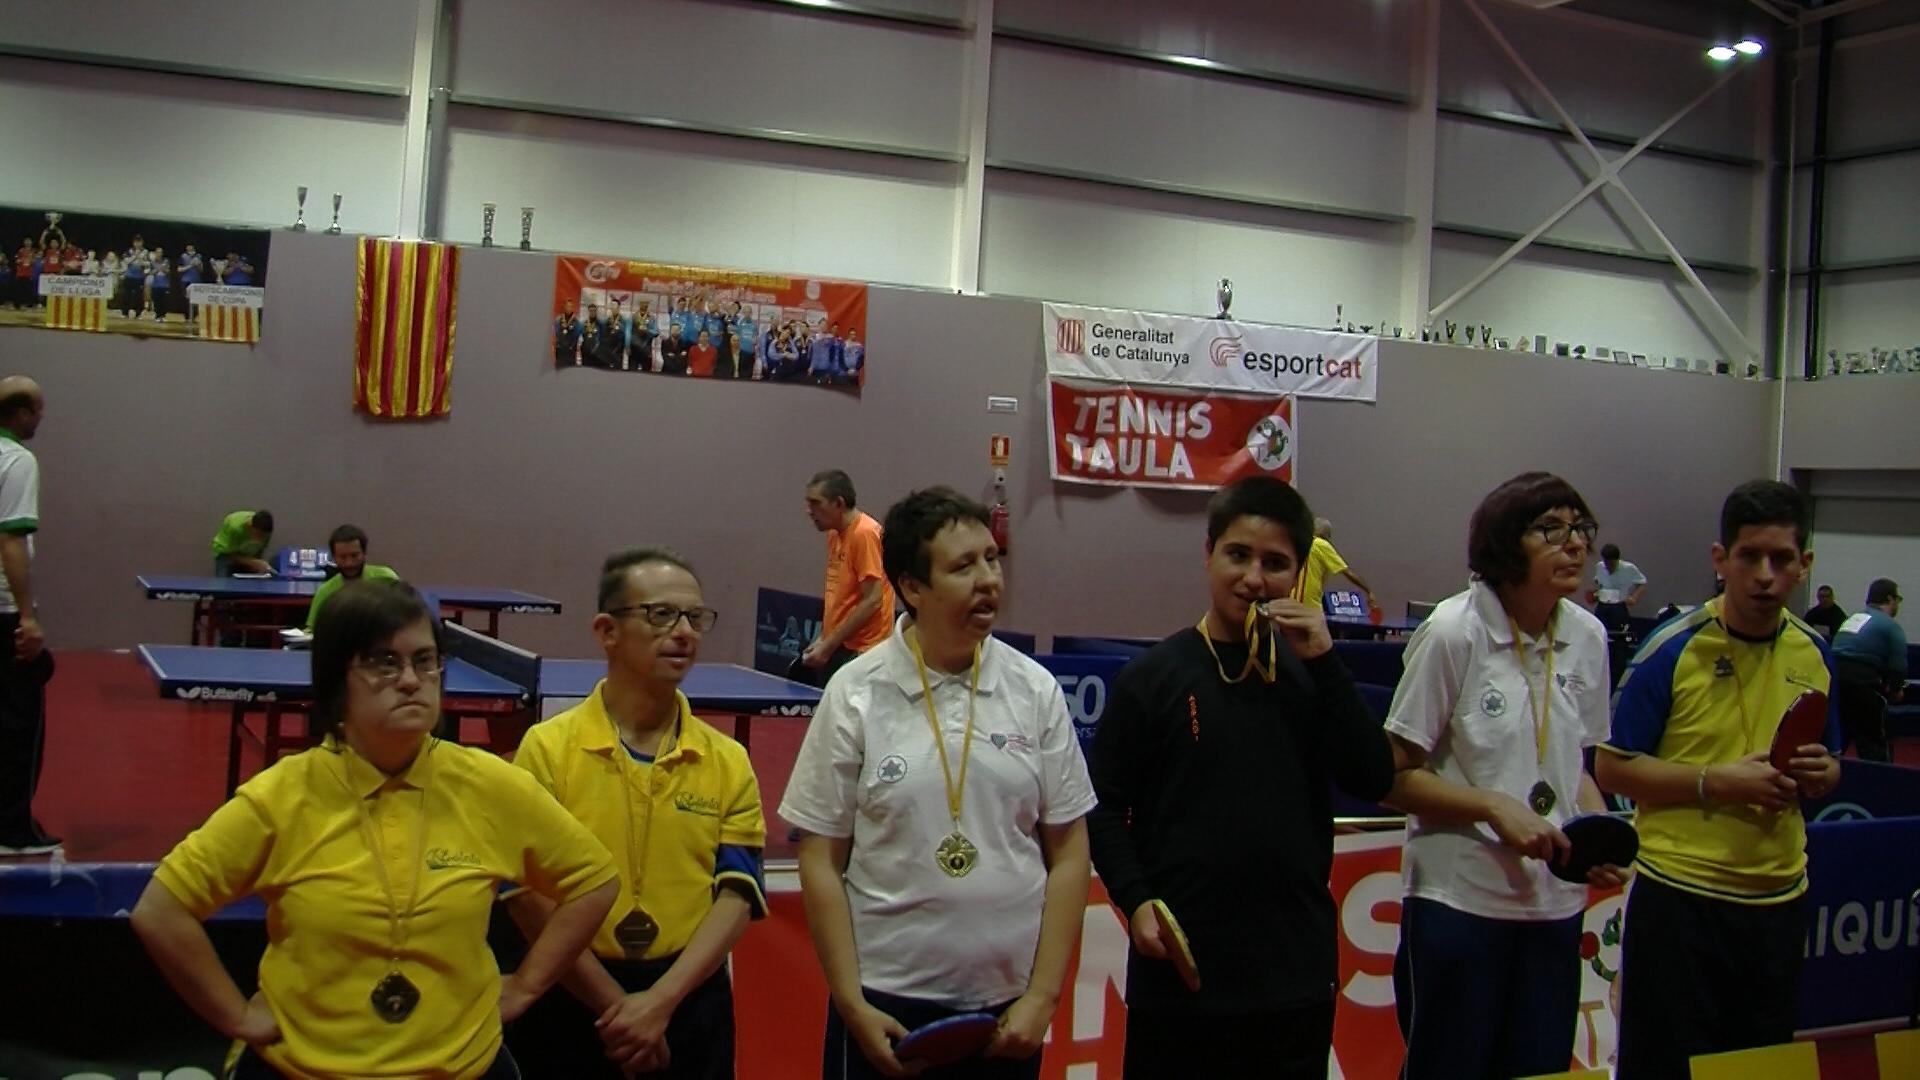 Campionat badminton.00_00_55_13.Imagen fija001